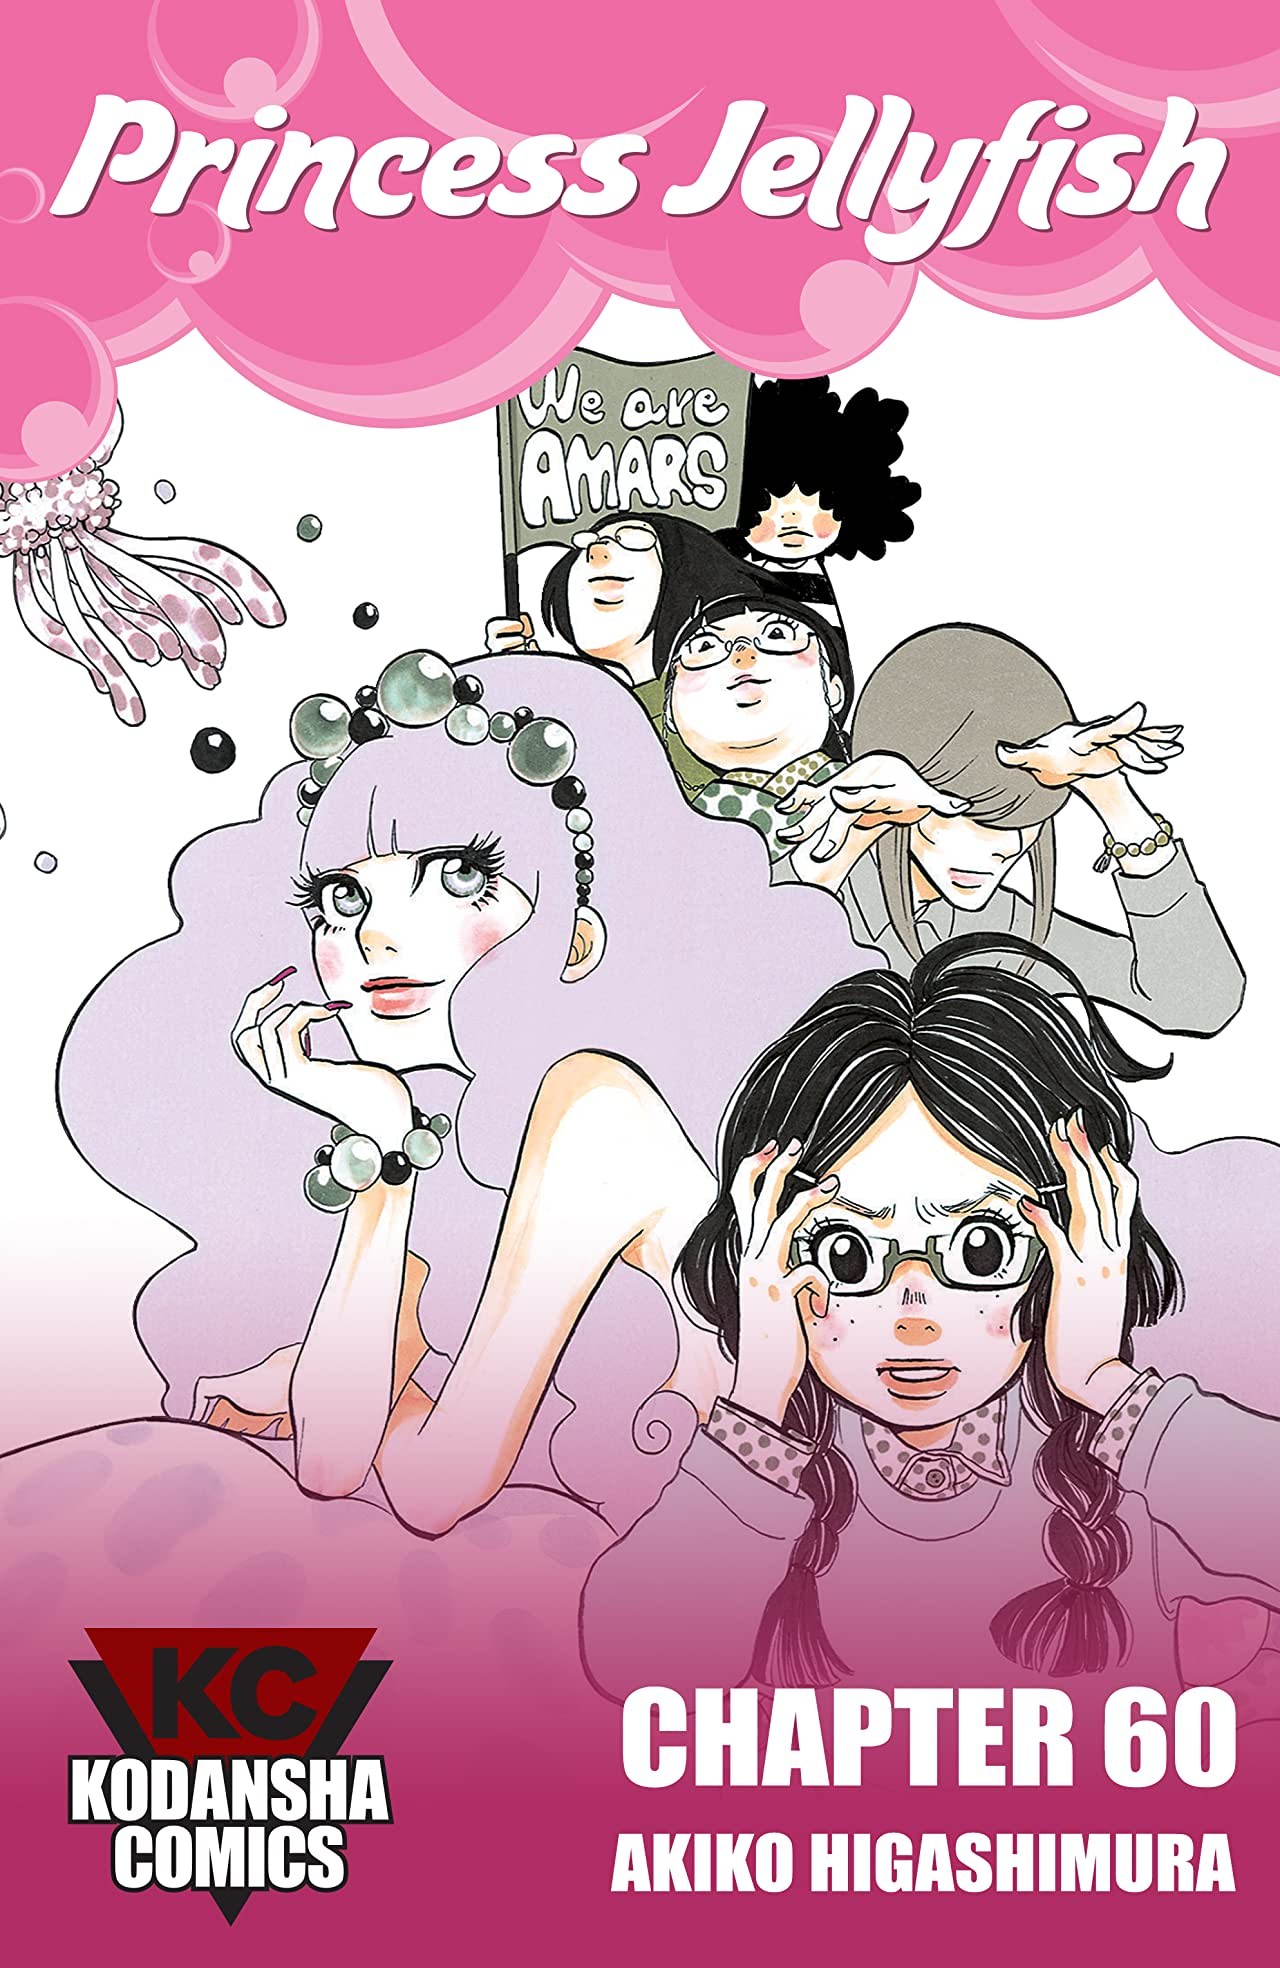 Princess Jellyfish #60